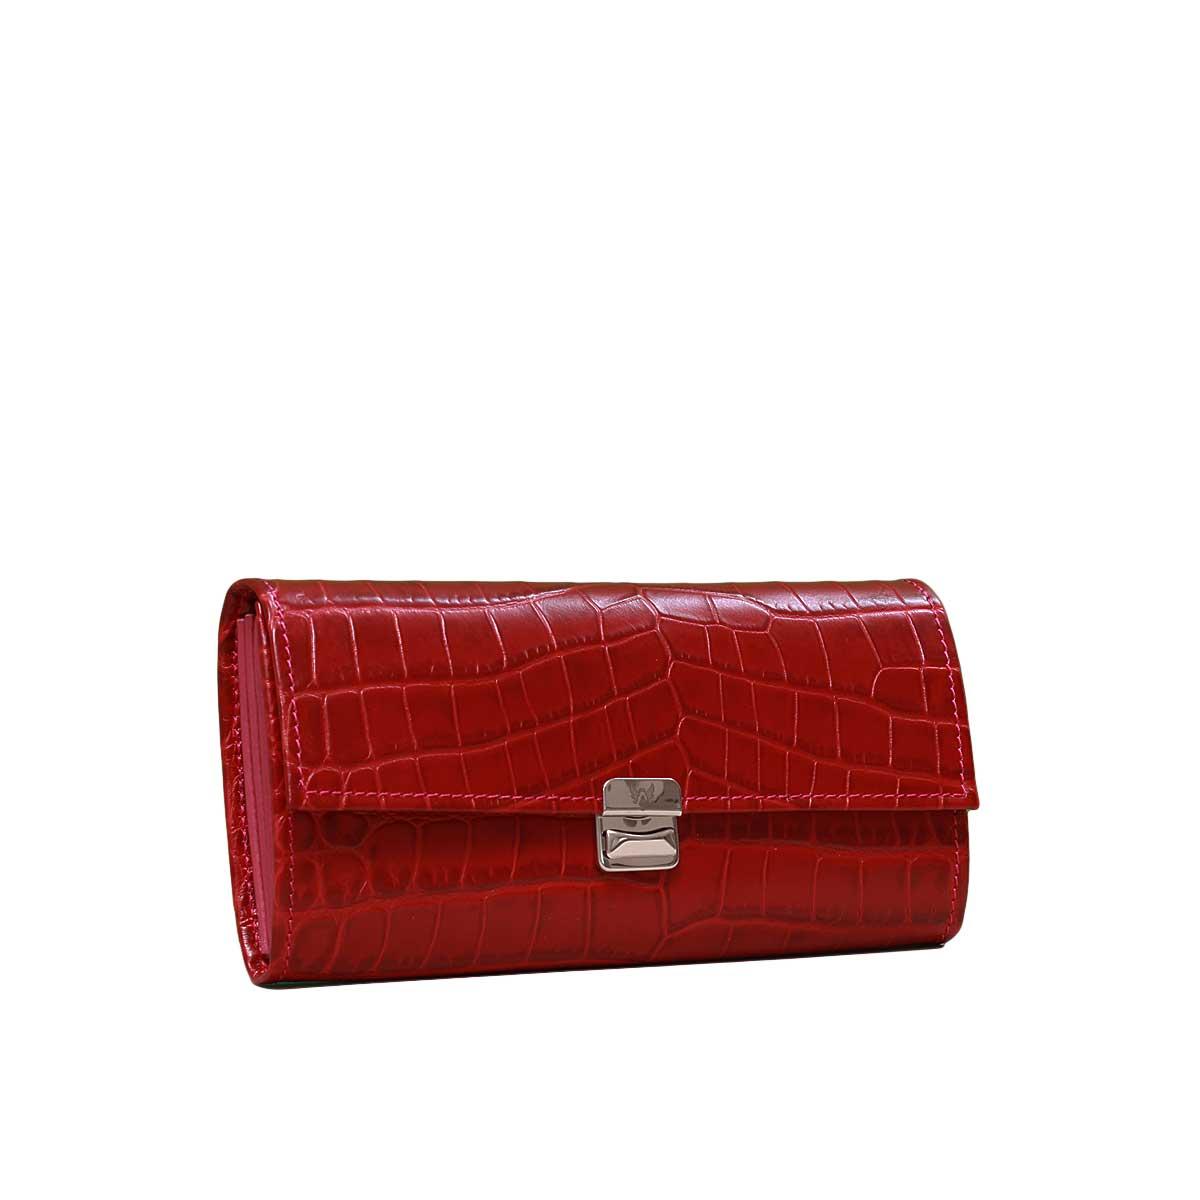 bf60c1d5eafd2 edle damen portemonnaies krokodilleder rot Leder Geldbörse Kroko Rot XL  elfenklang geldbeutel xl größe ...